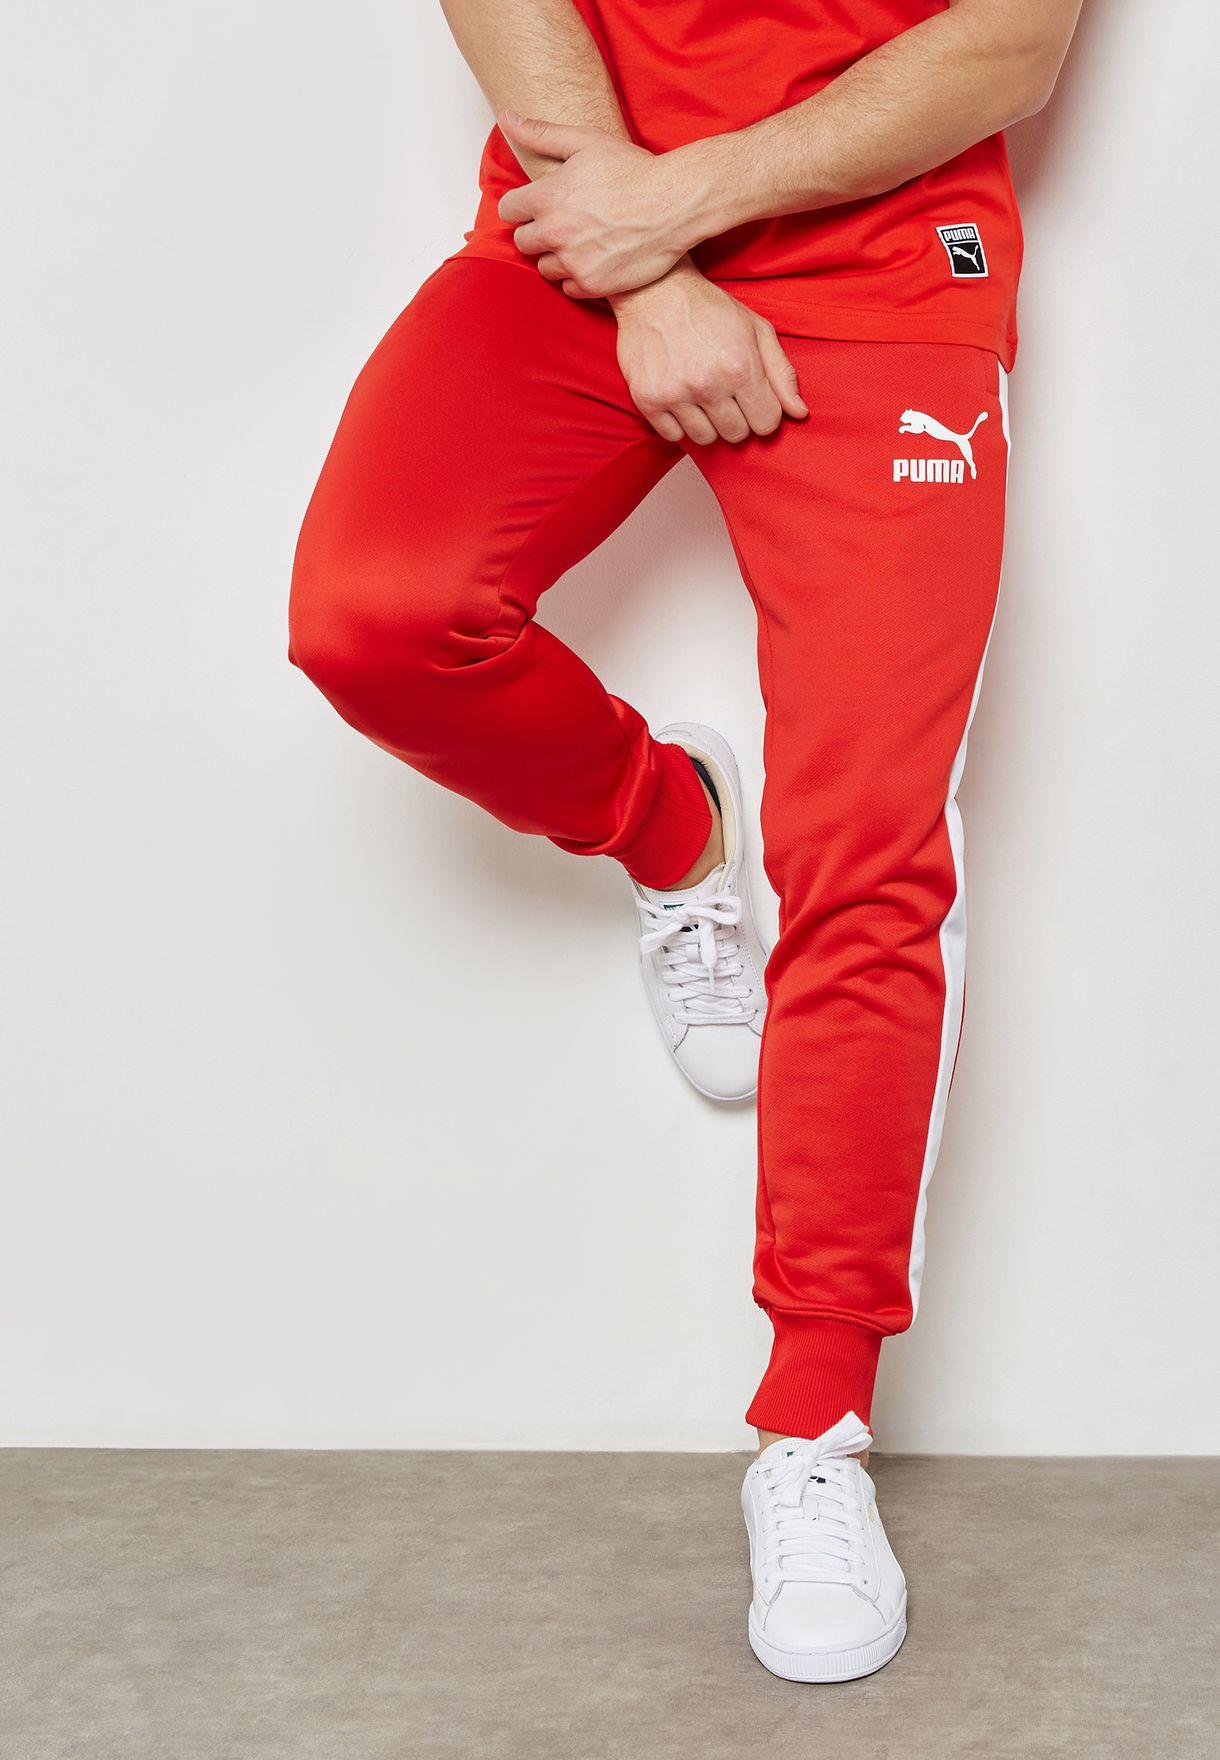 On Sale today! Puma PUMA Women's True Archive T7 Pants S